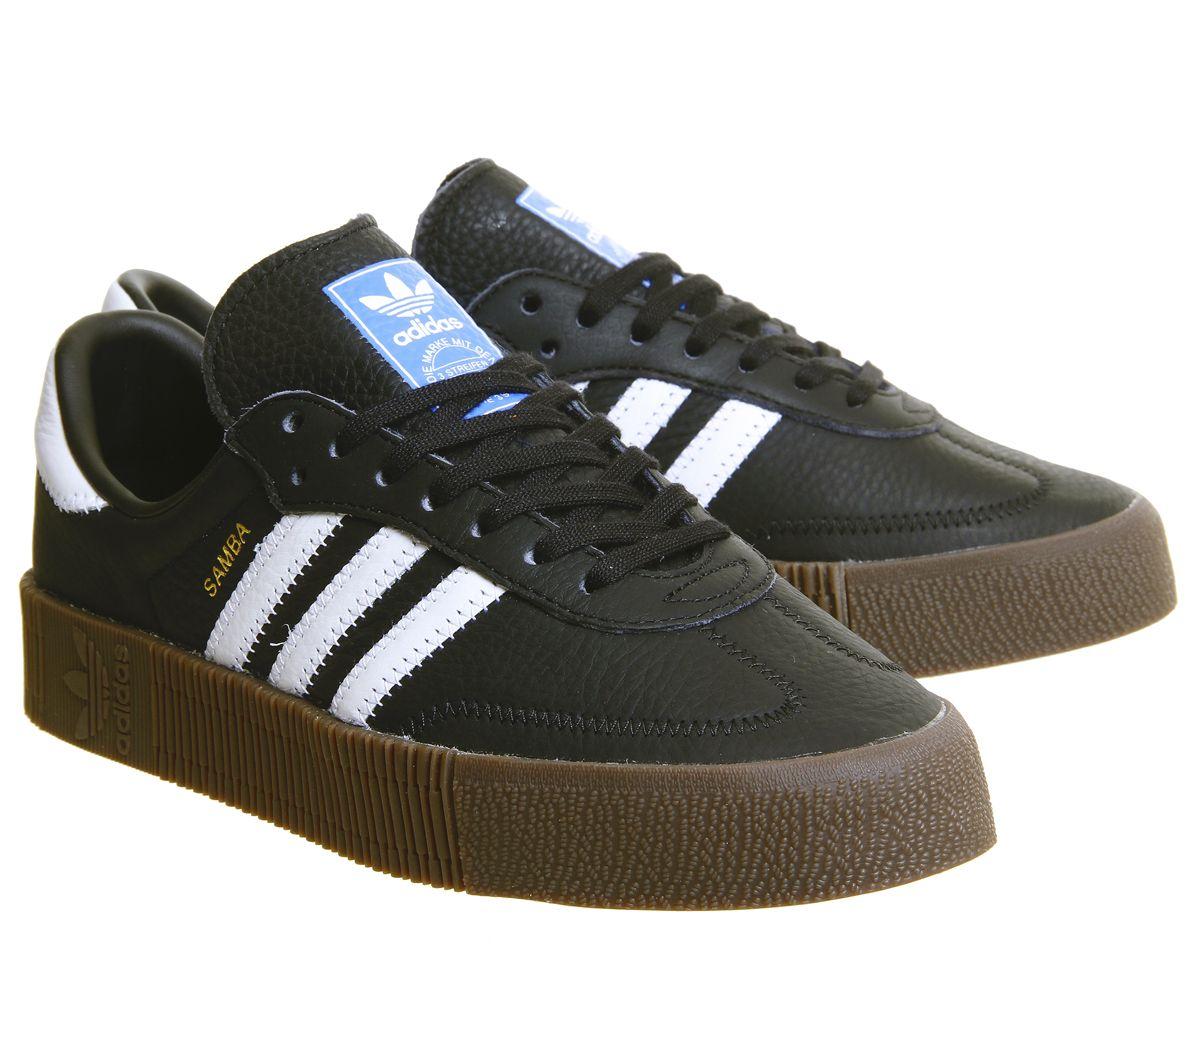 size 40 39d1c c0e70 Sentinel Womens Adidas Samba Rose Trainers Core Black White Gum Trainers  Shoes